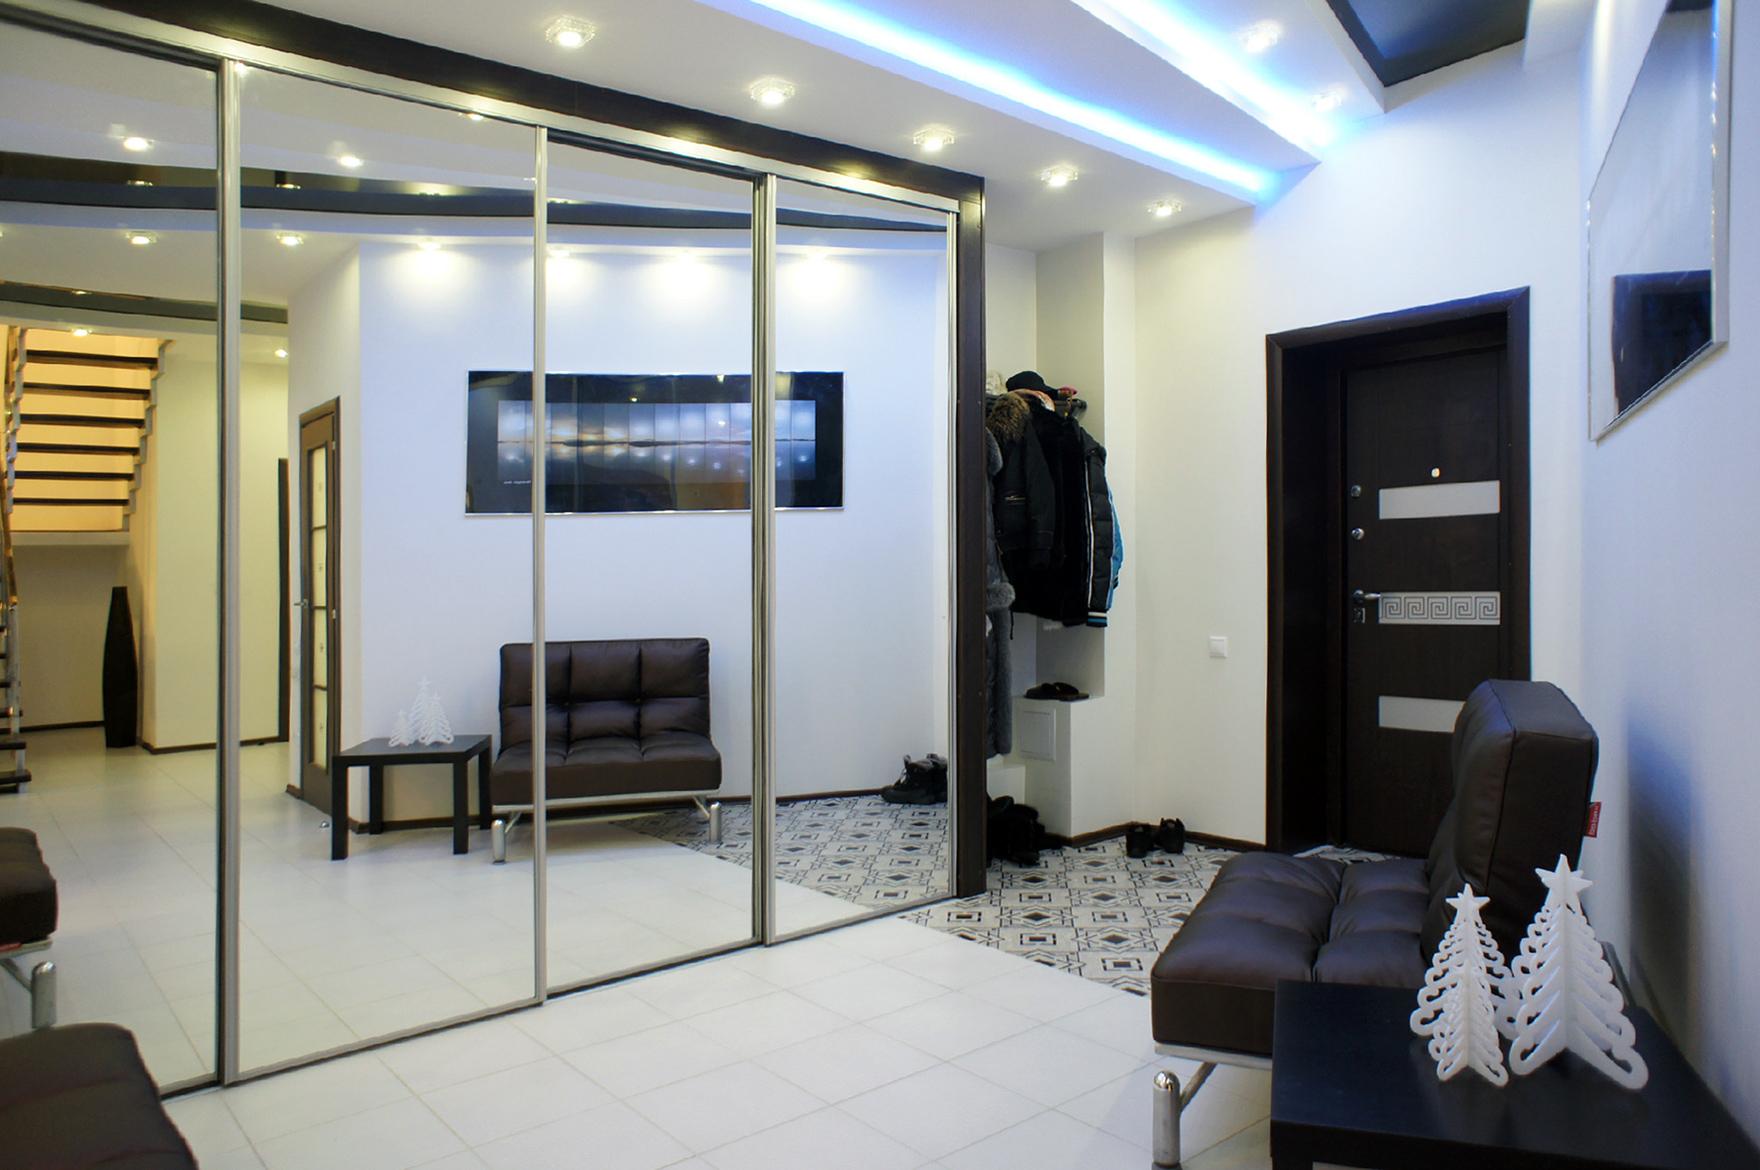 Дизайн квартиры в братске, 252 кв.м. фото ремонта.ру - фото .